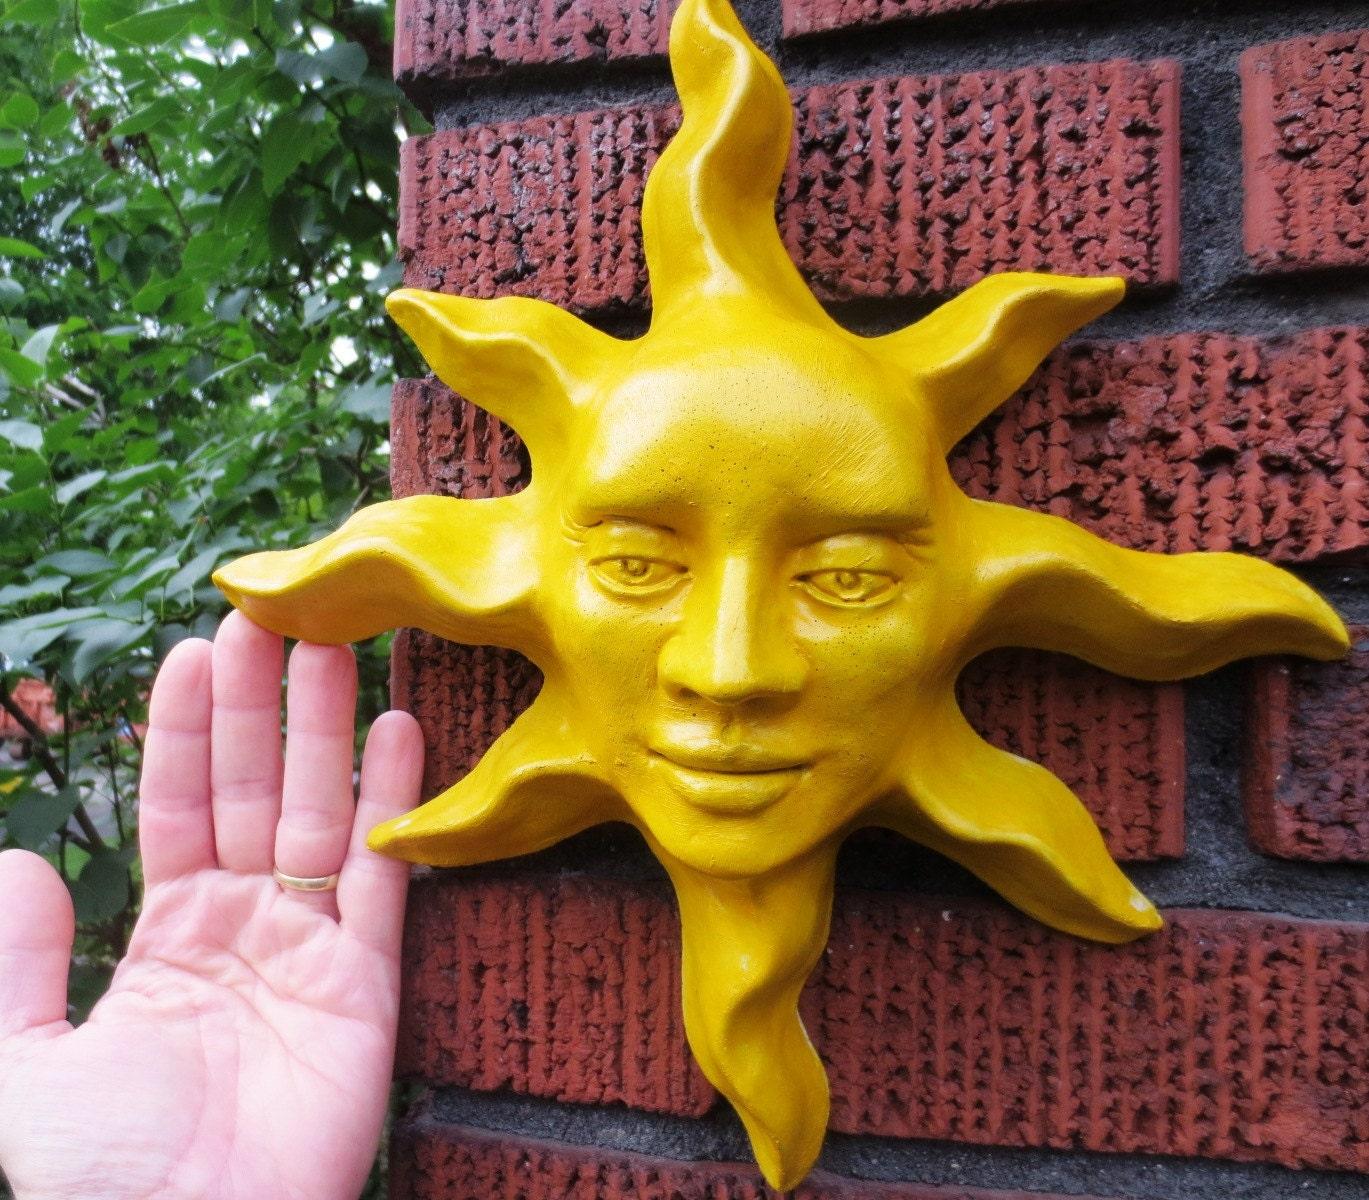 Yellow Sun Wall Decor : Handmade yellow sun face sculpture wall art for home by